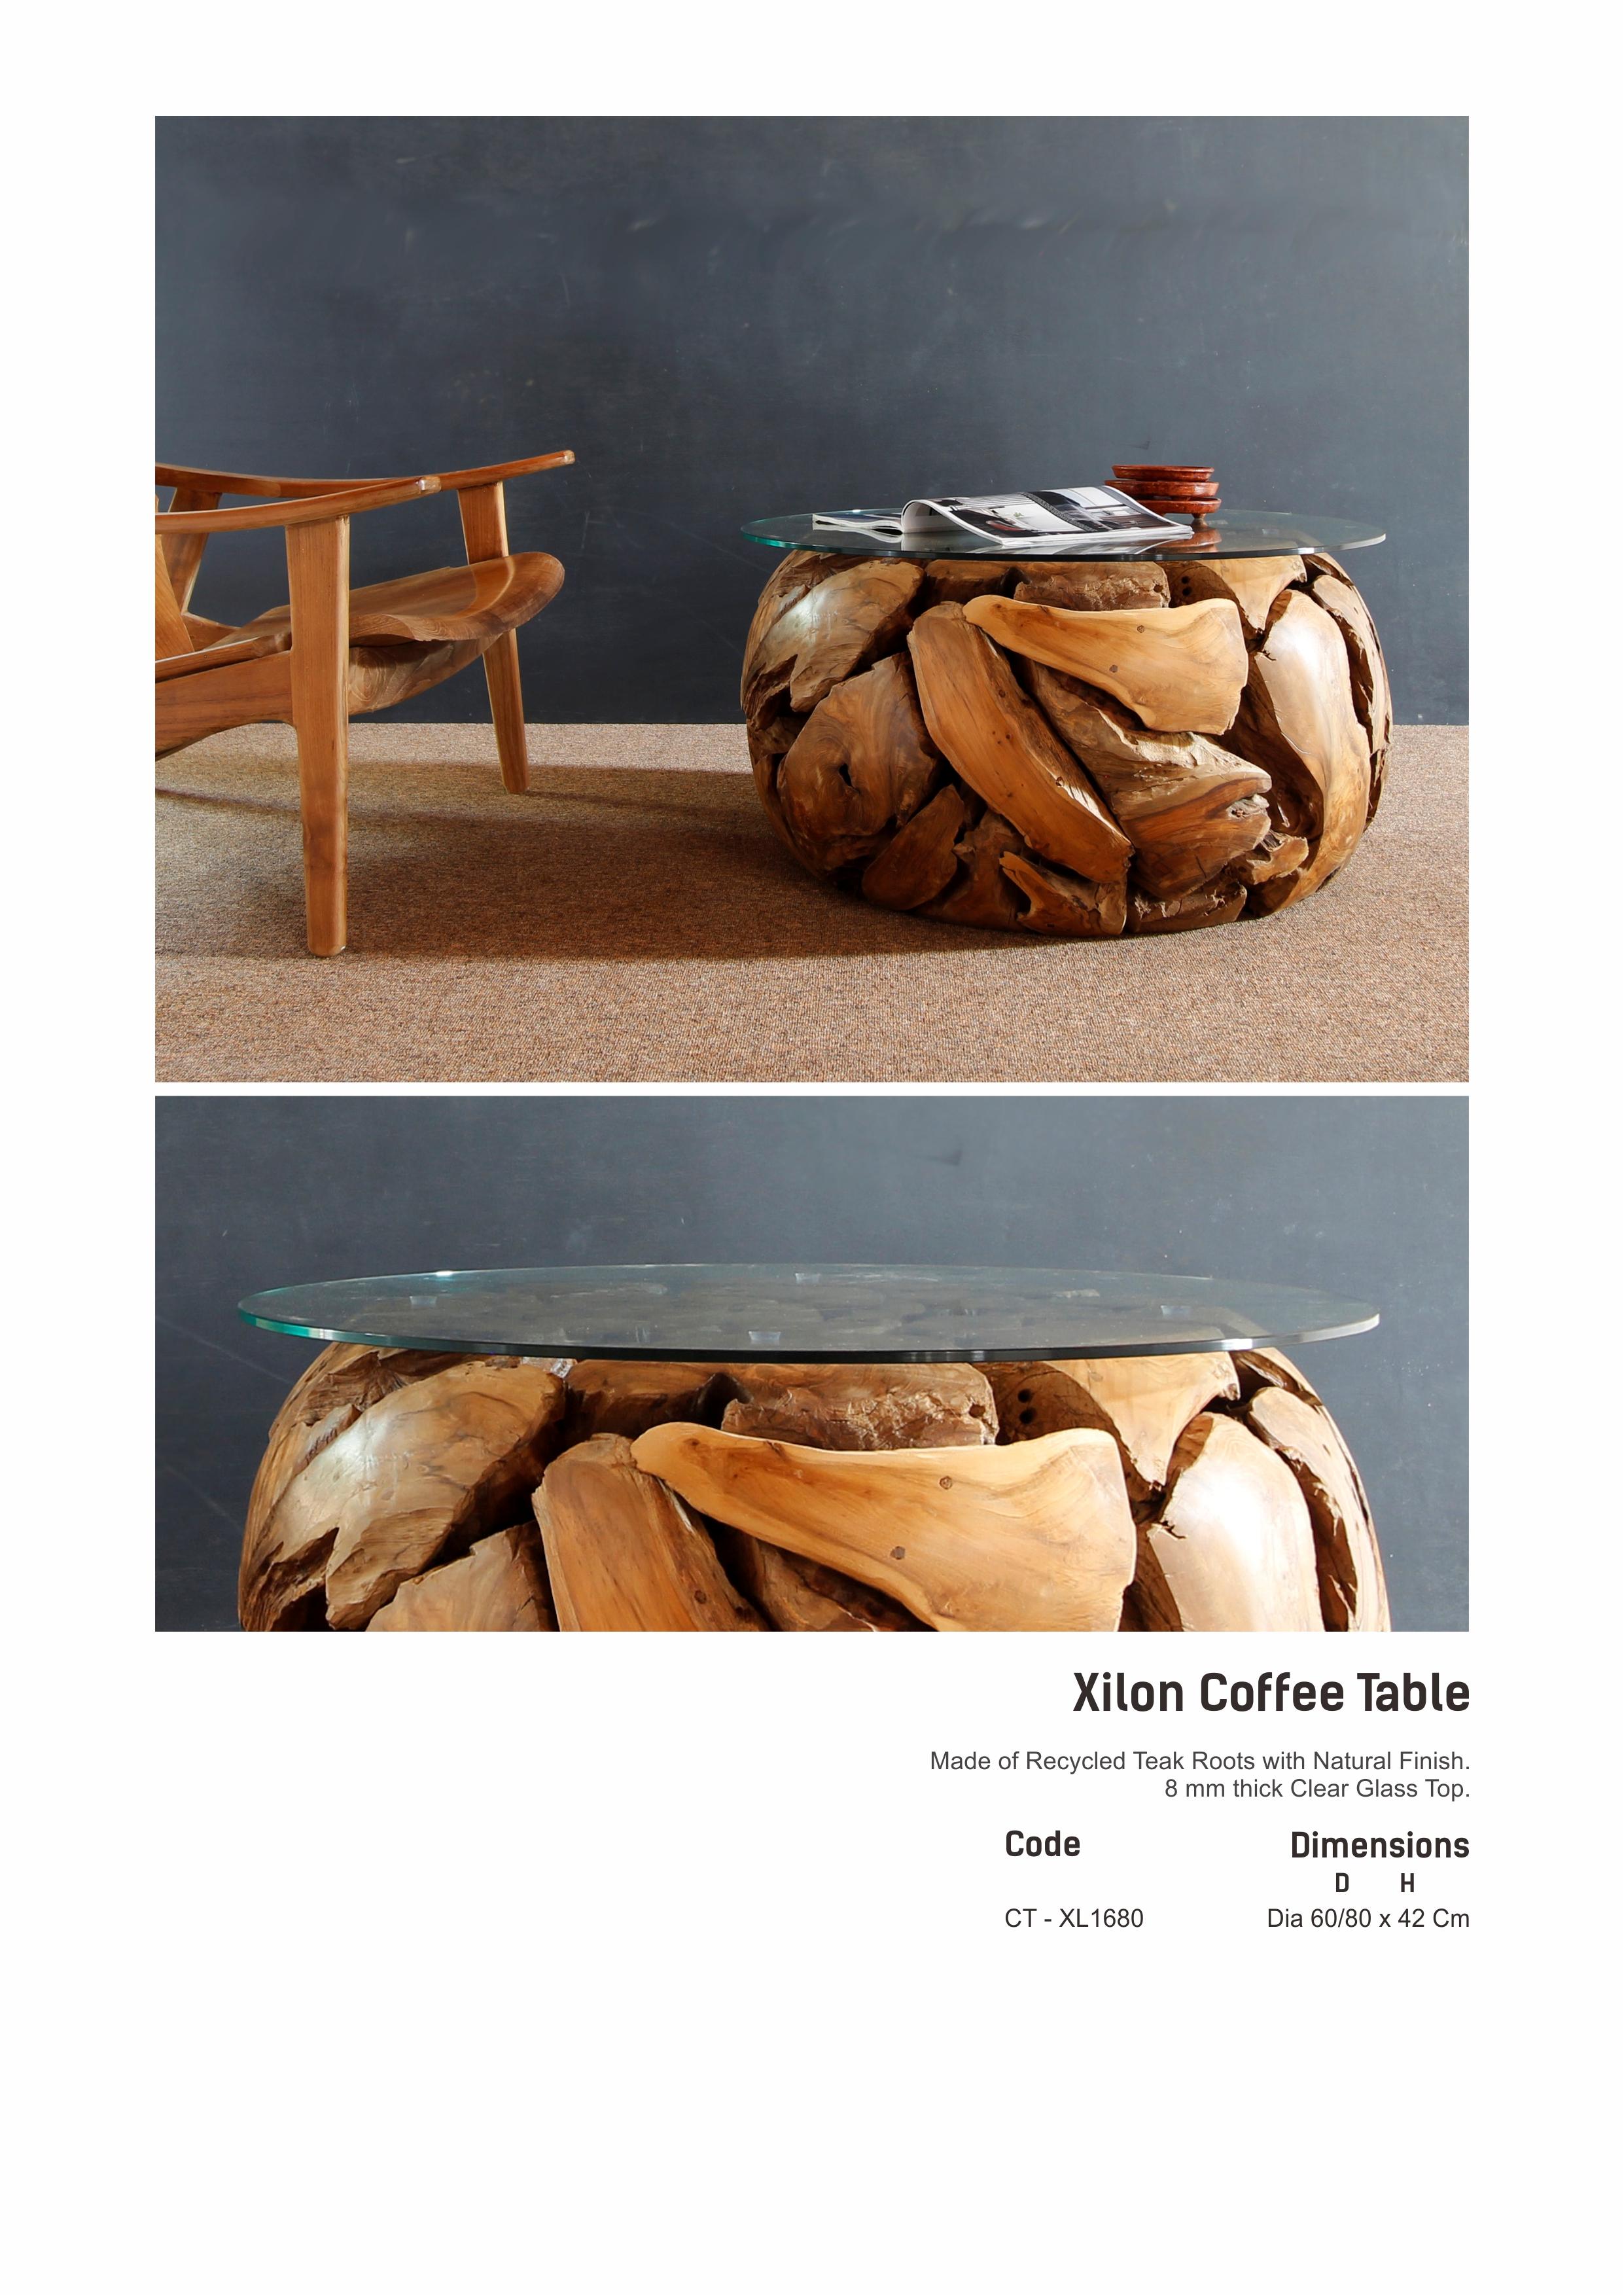 16. XILON Coffee Table